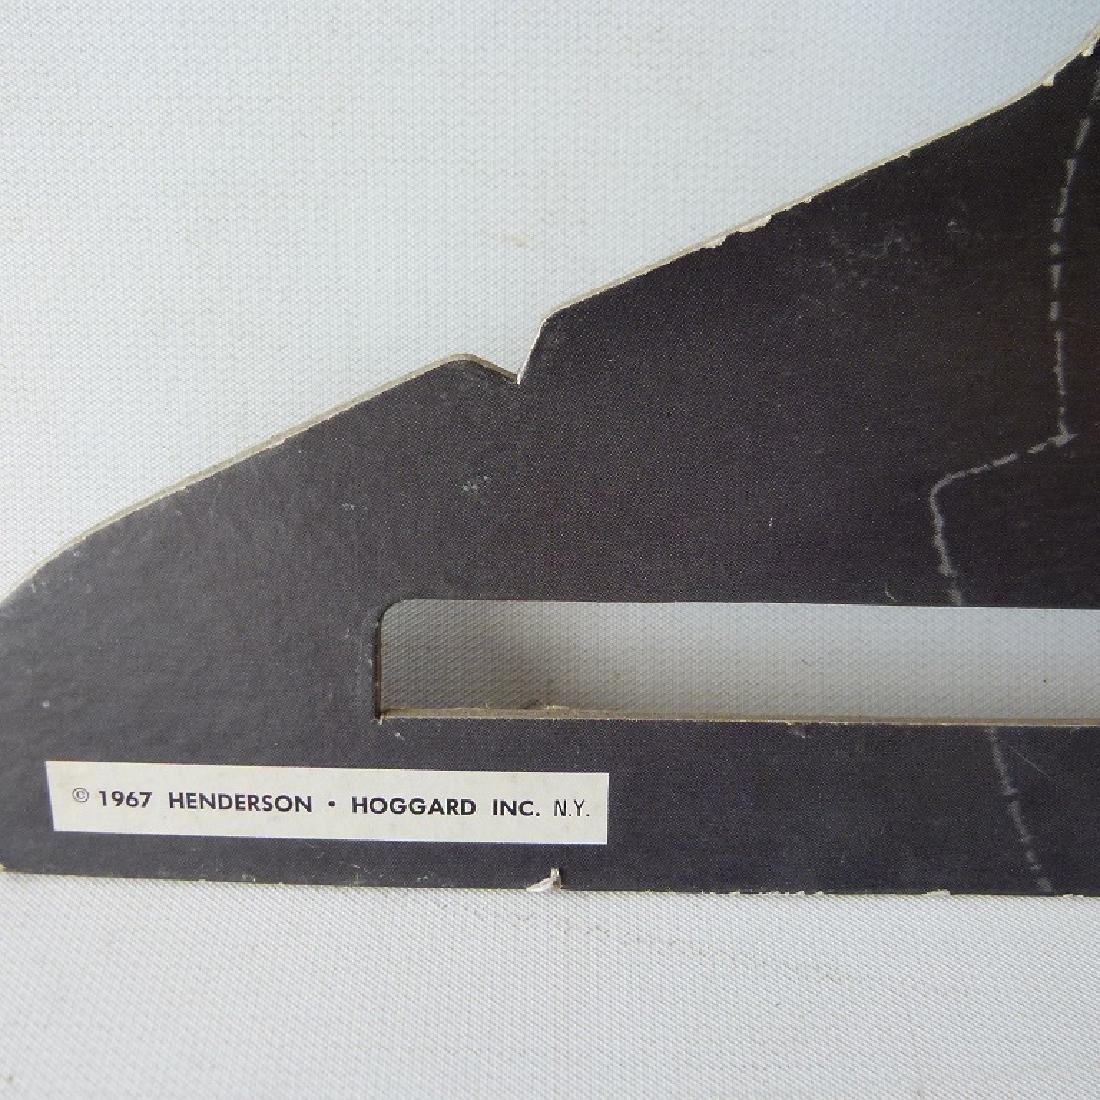 LOT (8)  POP-ART CLOTHES HANGERS, C. 1967 - 3